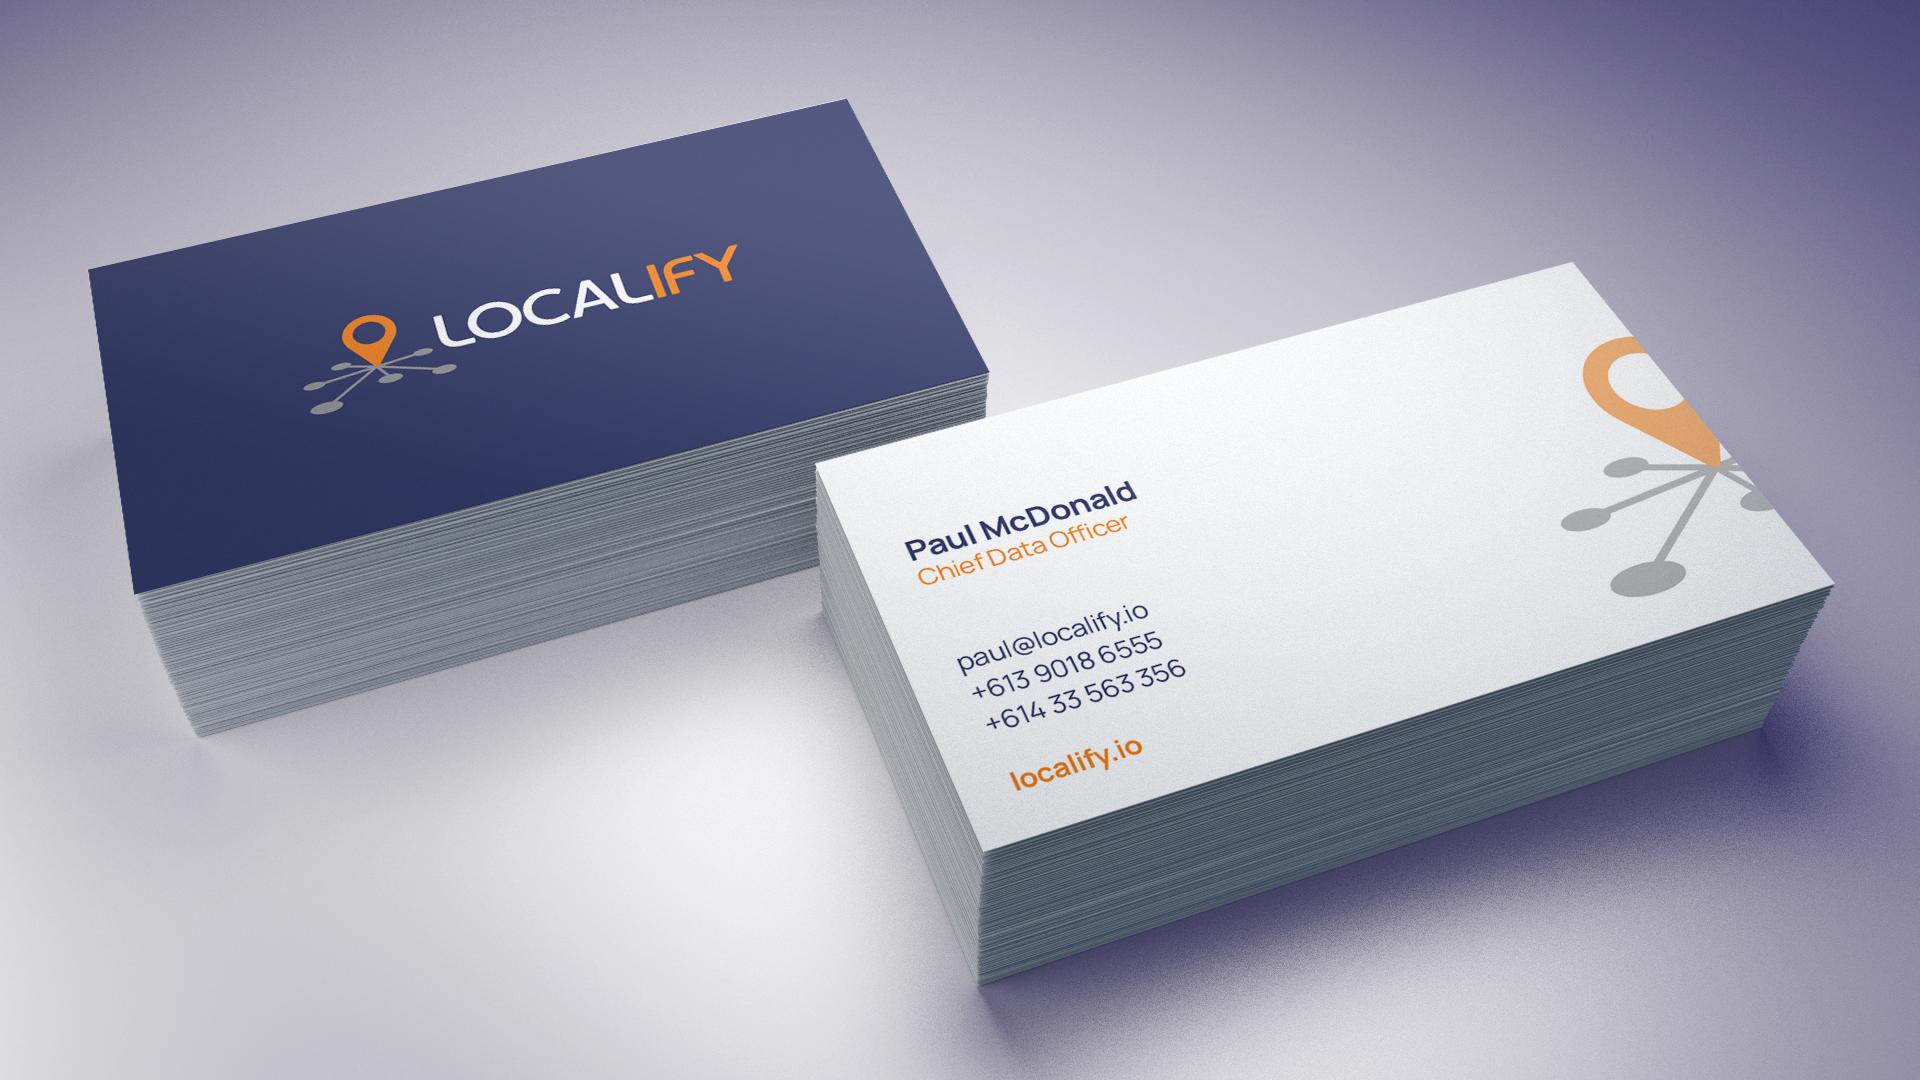 Localify